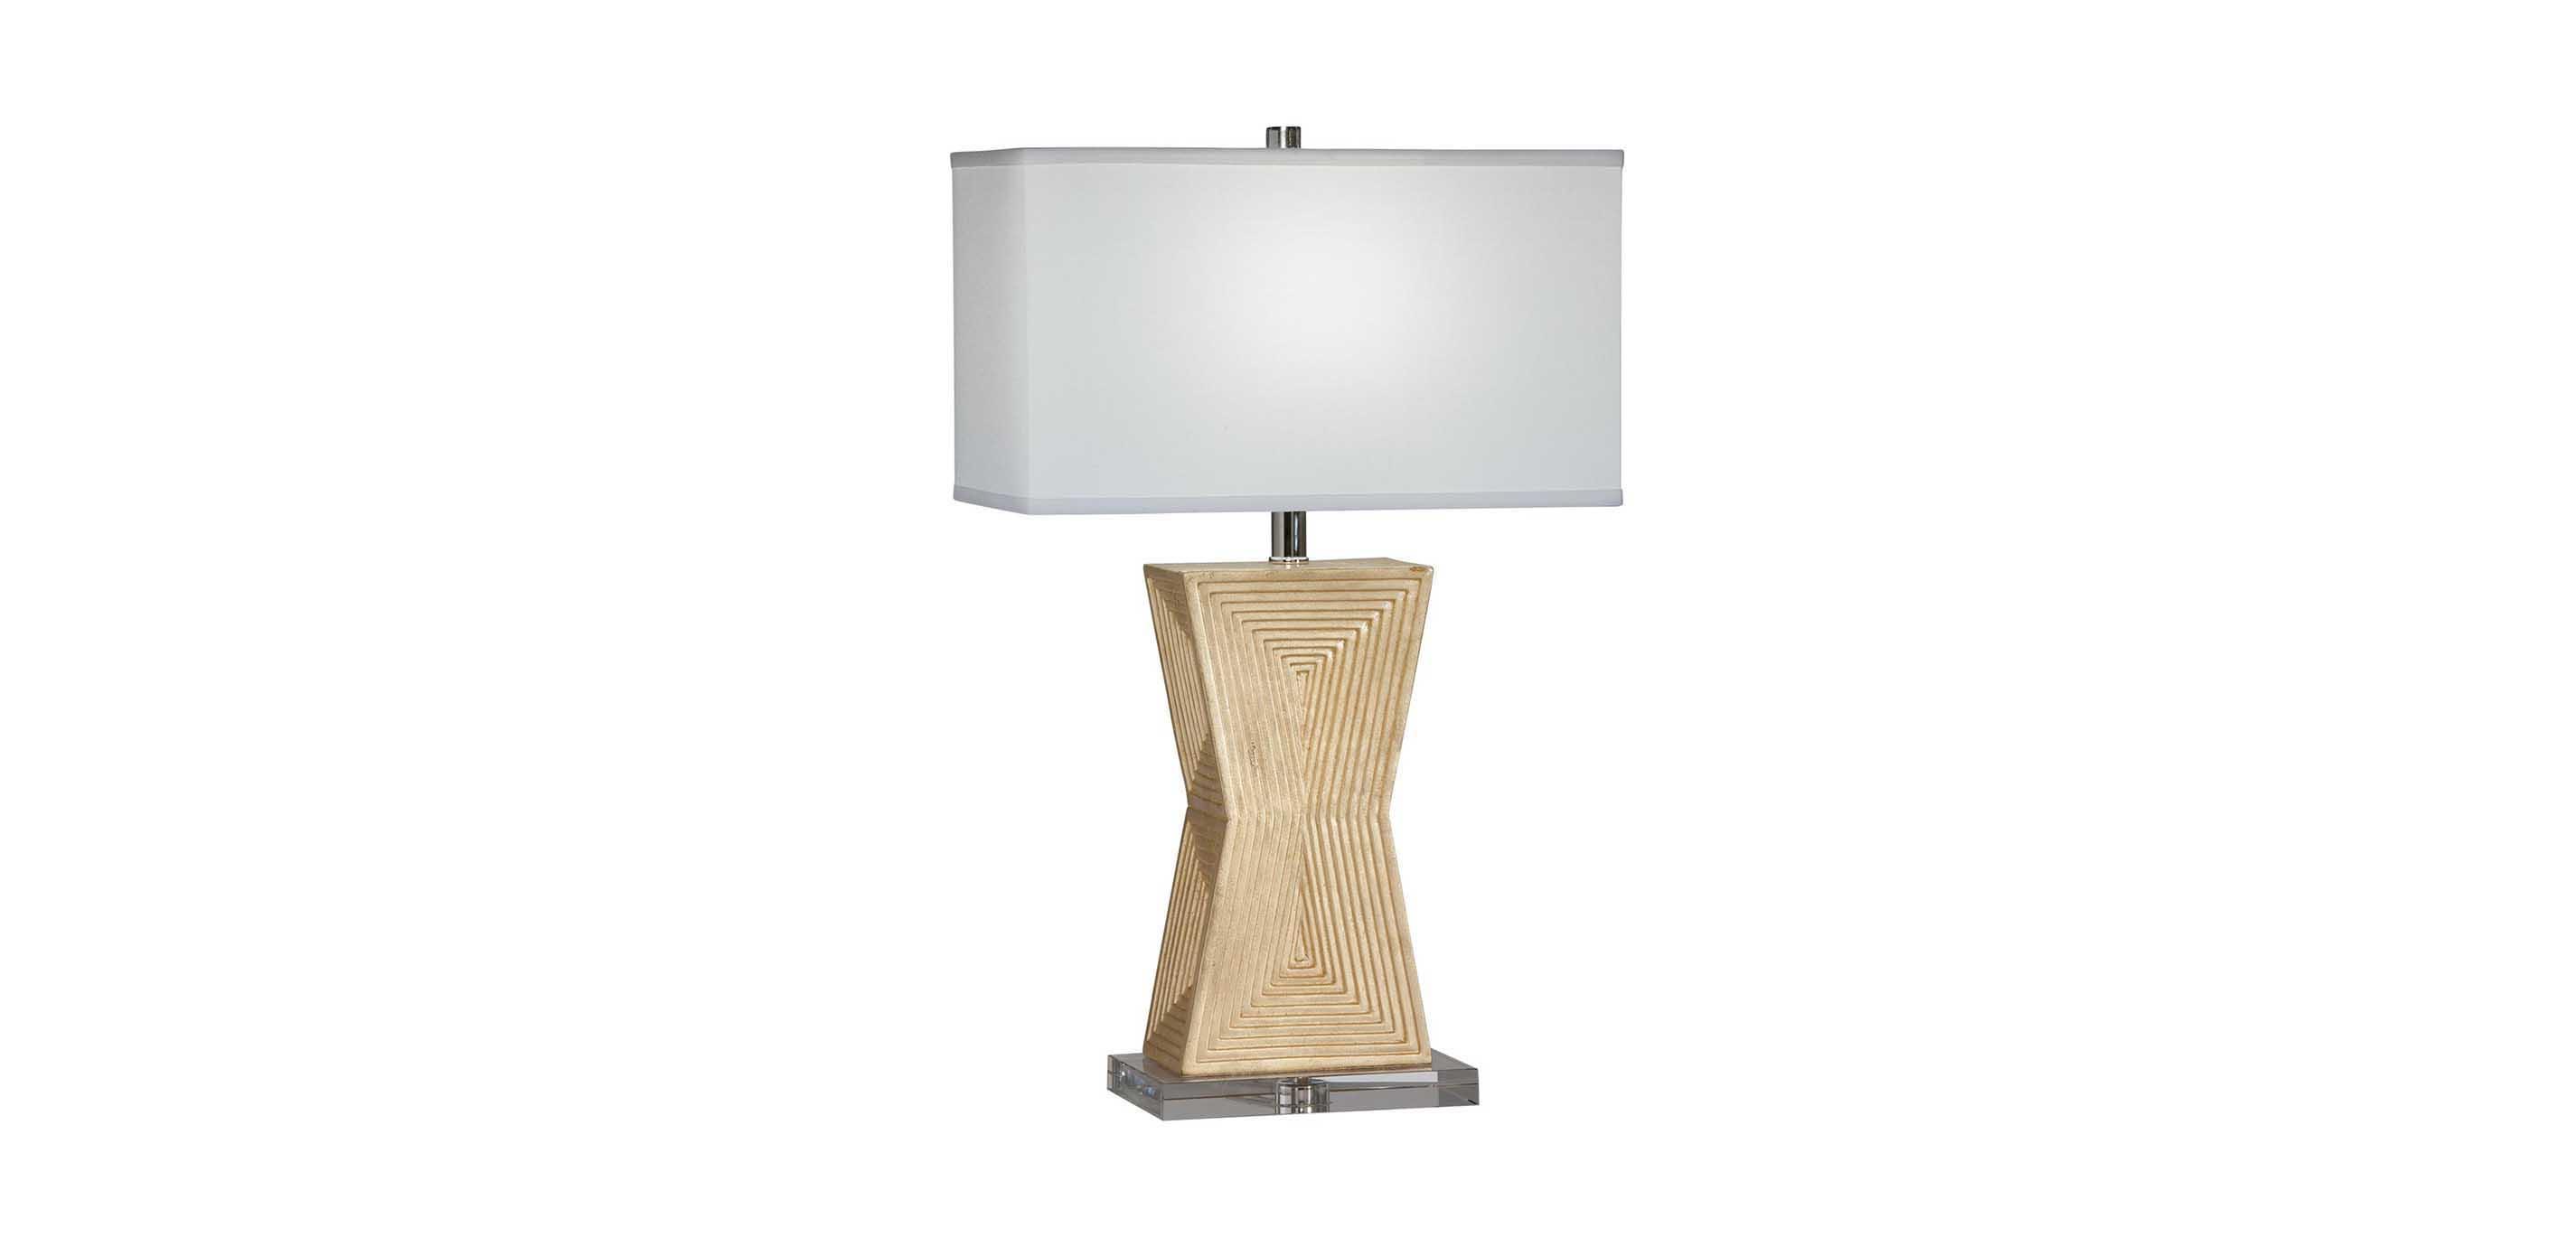 Images Saxon Geometric Table Lamp , , Large_gray